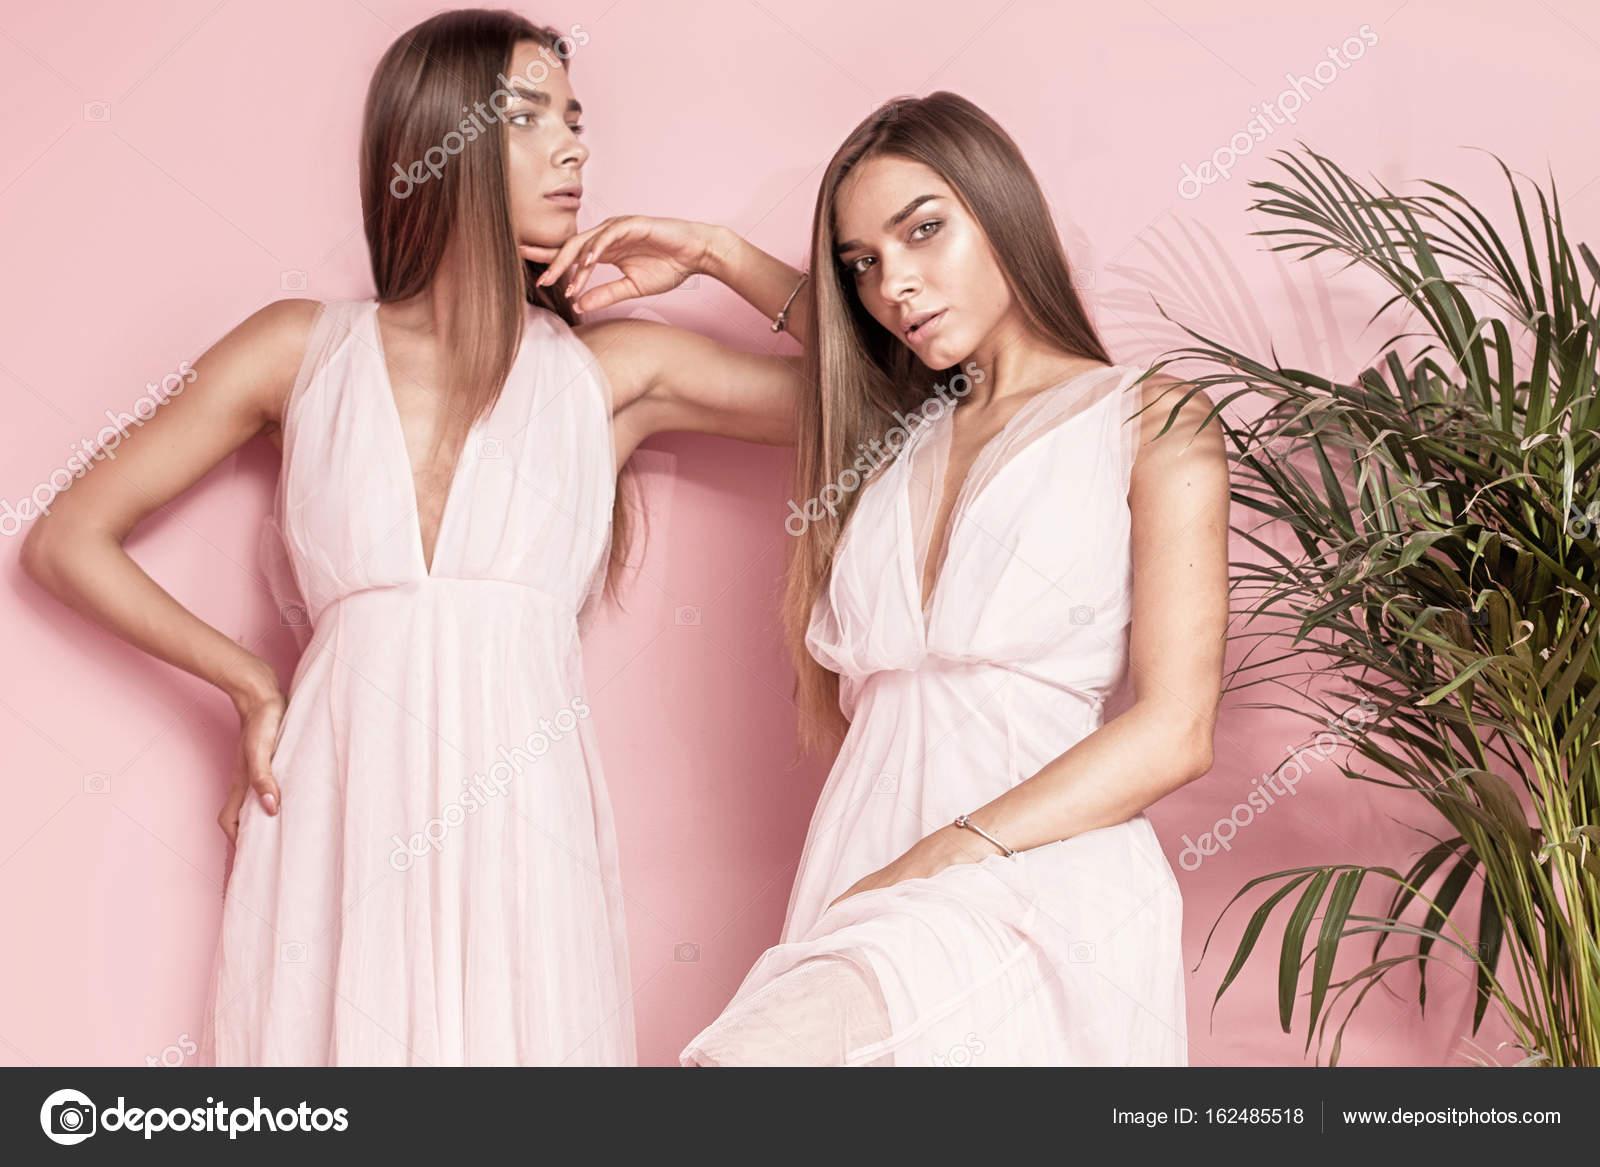 44f6d812f8a1 Δύο γυναικεία μοντέλα που ποζάρουν στα κομψά φορέματα — Φωτογραφία Αρχείου